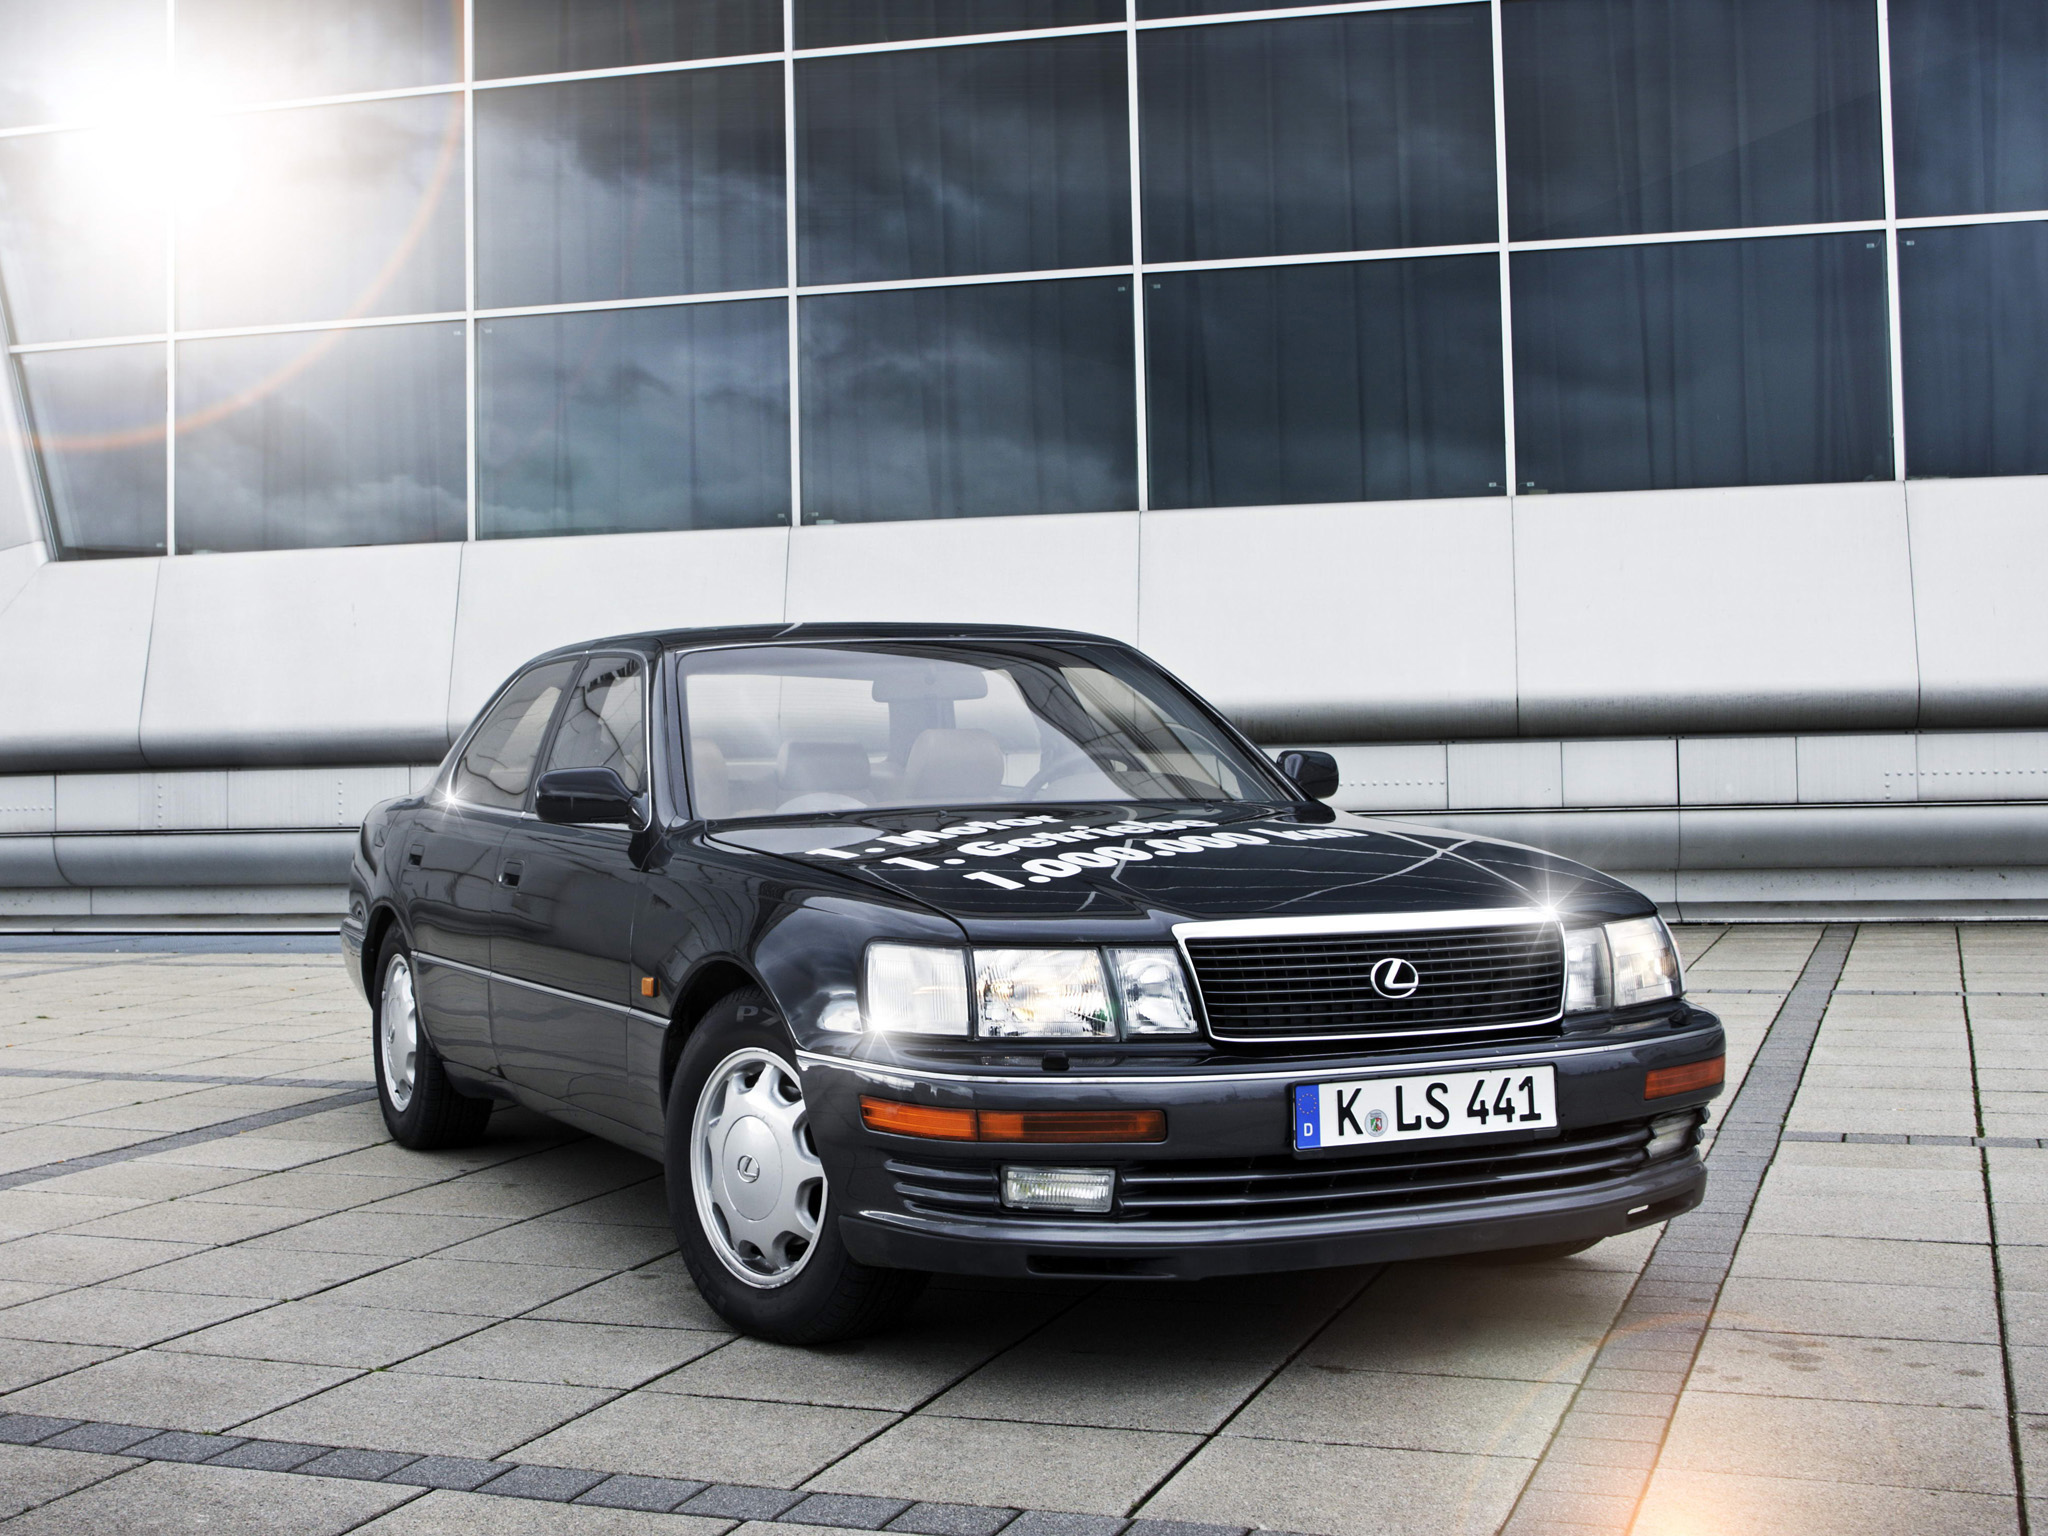 Photo of Lexus LS 400 #81765. Image size: 2048 x 1536. Upload date ...